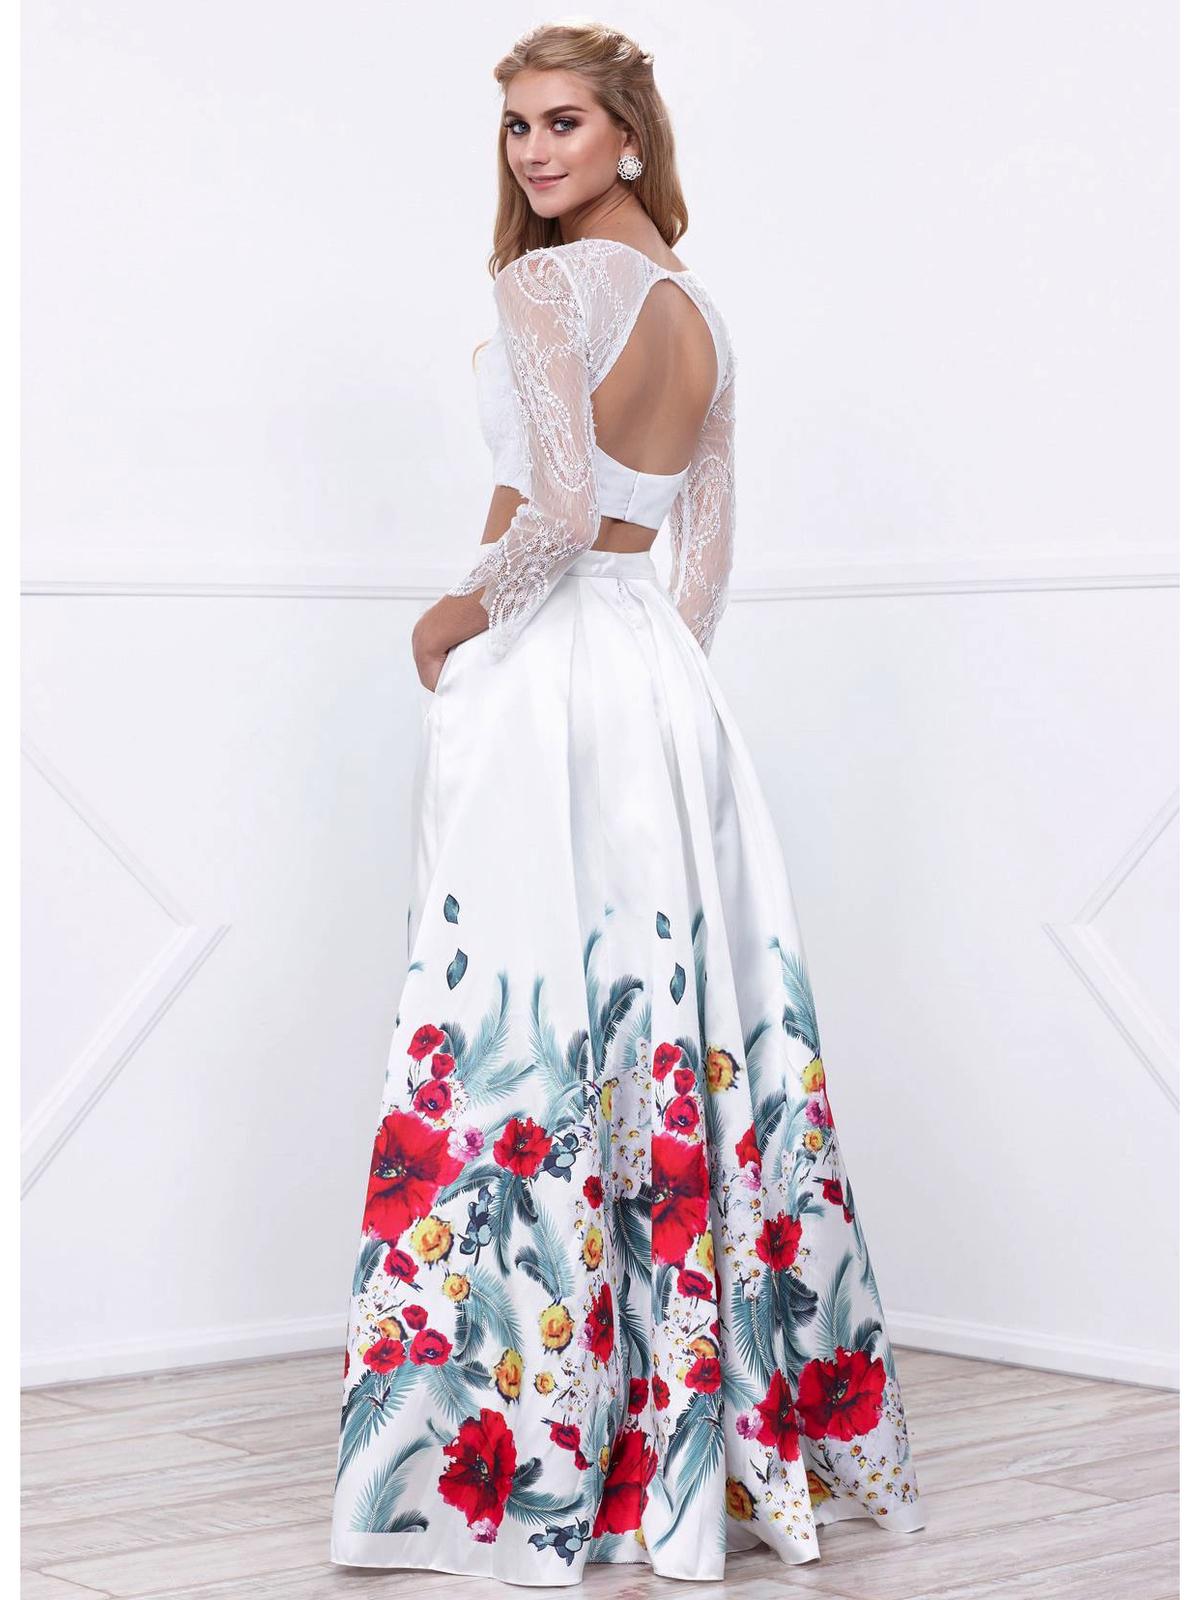 Long sleeve two piece homecoming dress nairobi from